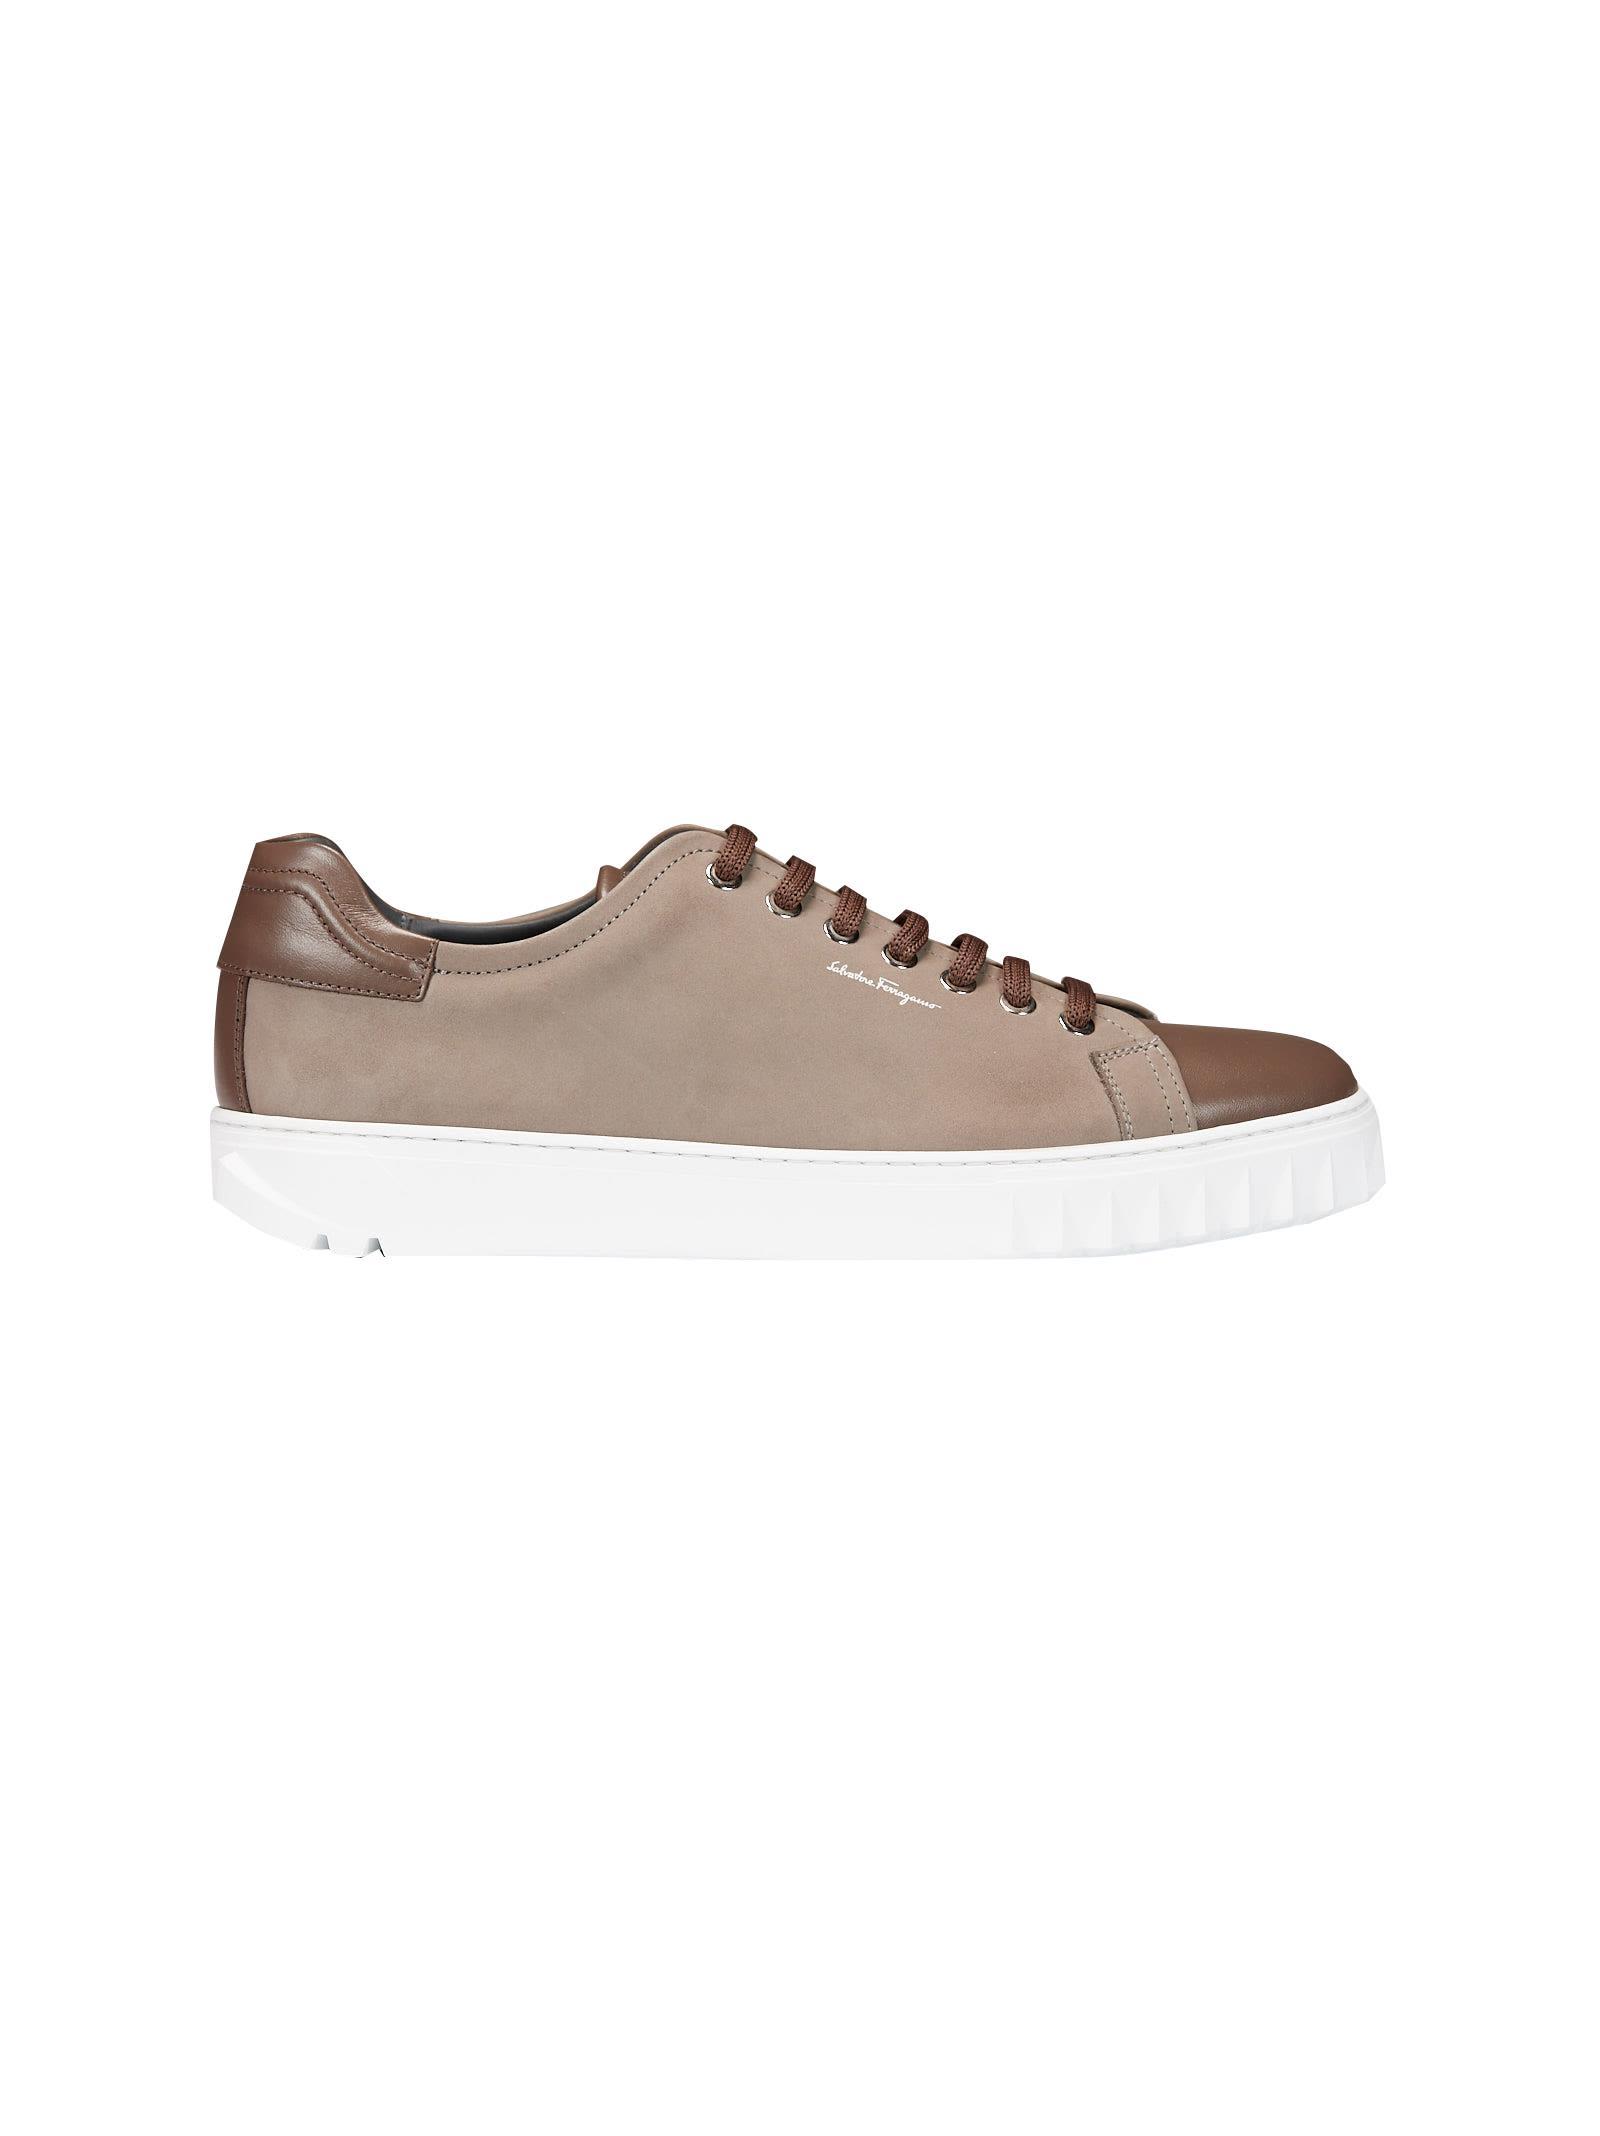 Salvatore Ferragamo Clyde sneakers gQ8EgIcC